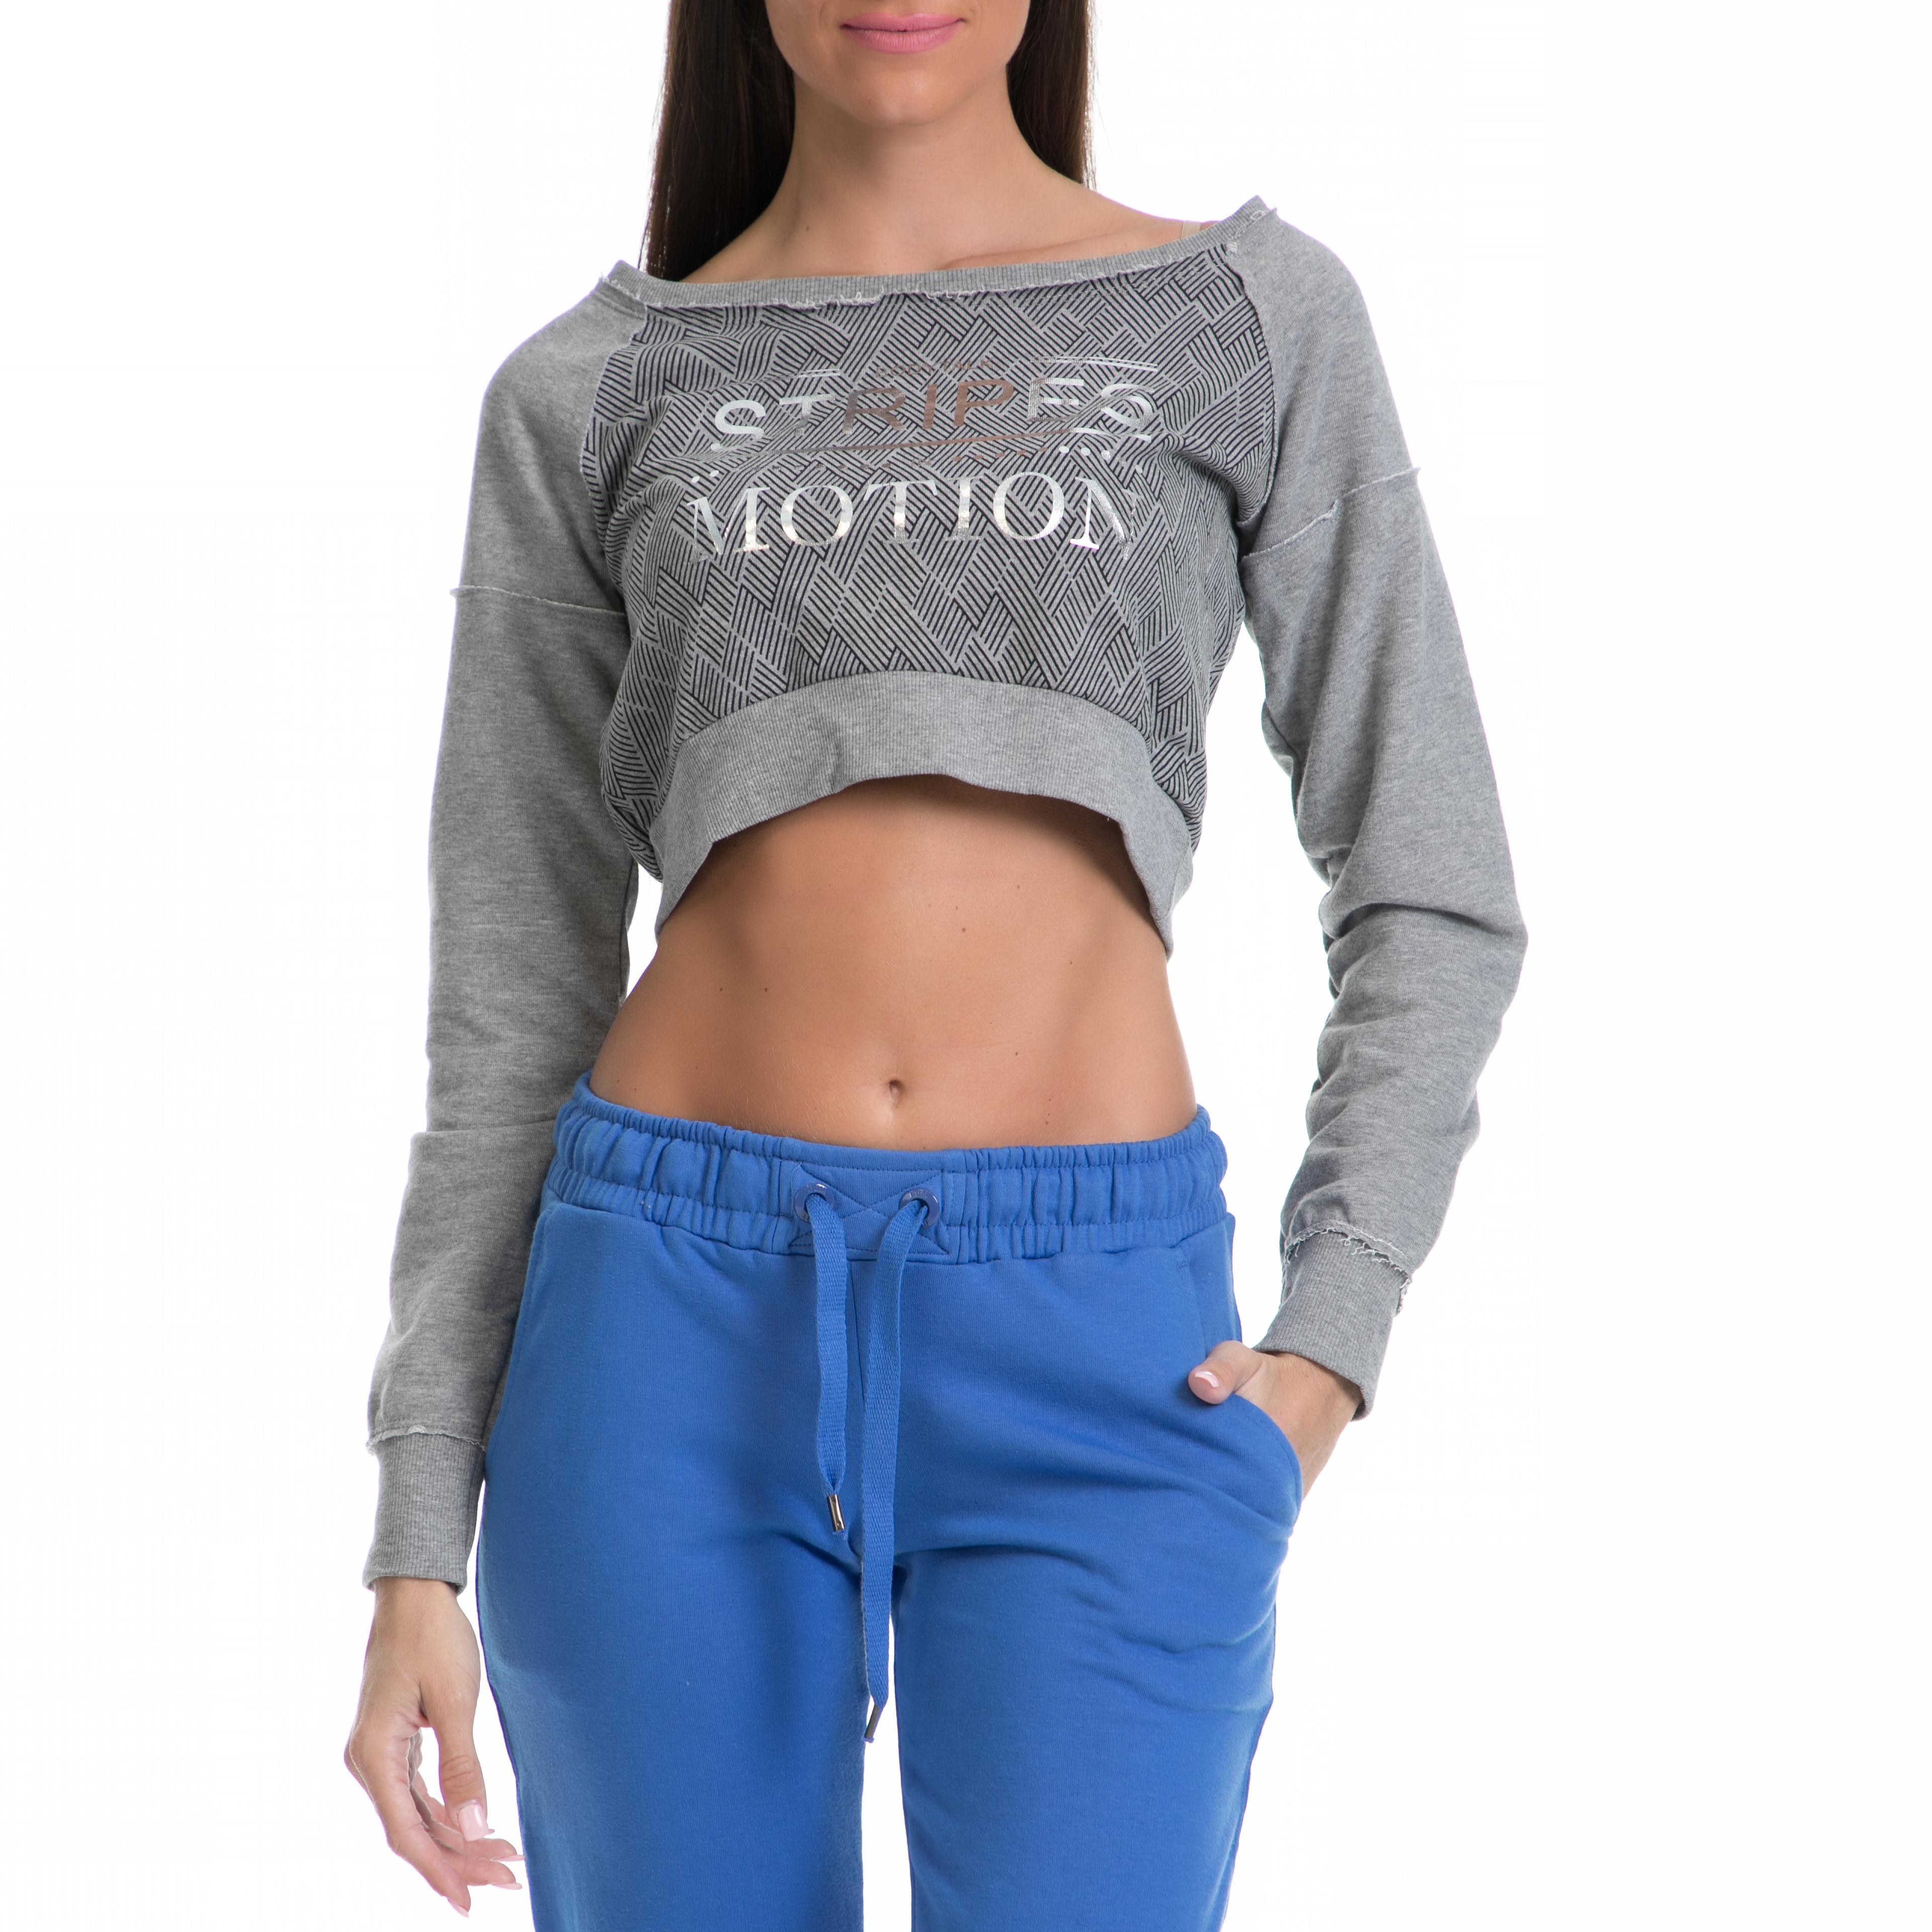 BODYTALK - Γυναικεία μπλούζα BODYTALK γκρι γυναικεία ρούχα αθλητικά φούτερ μακρυμάνικα